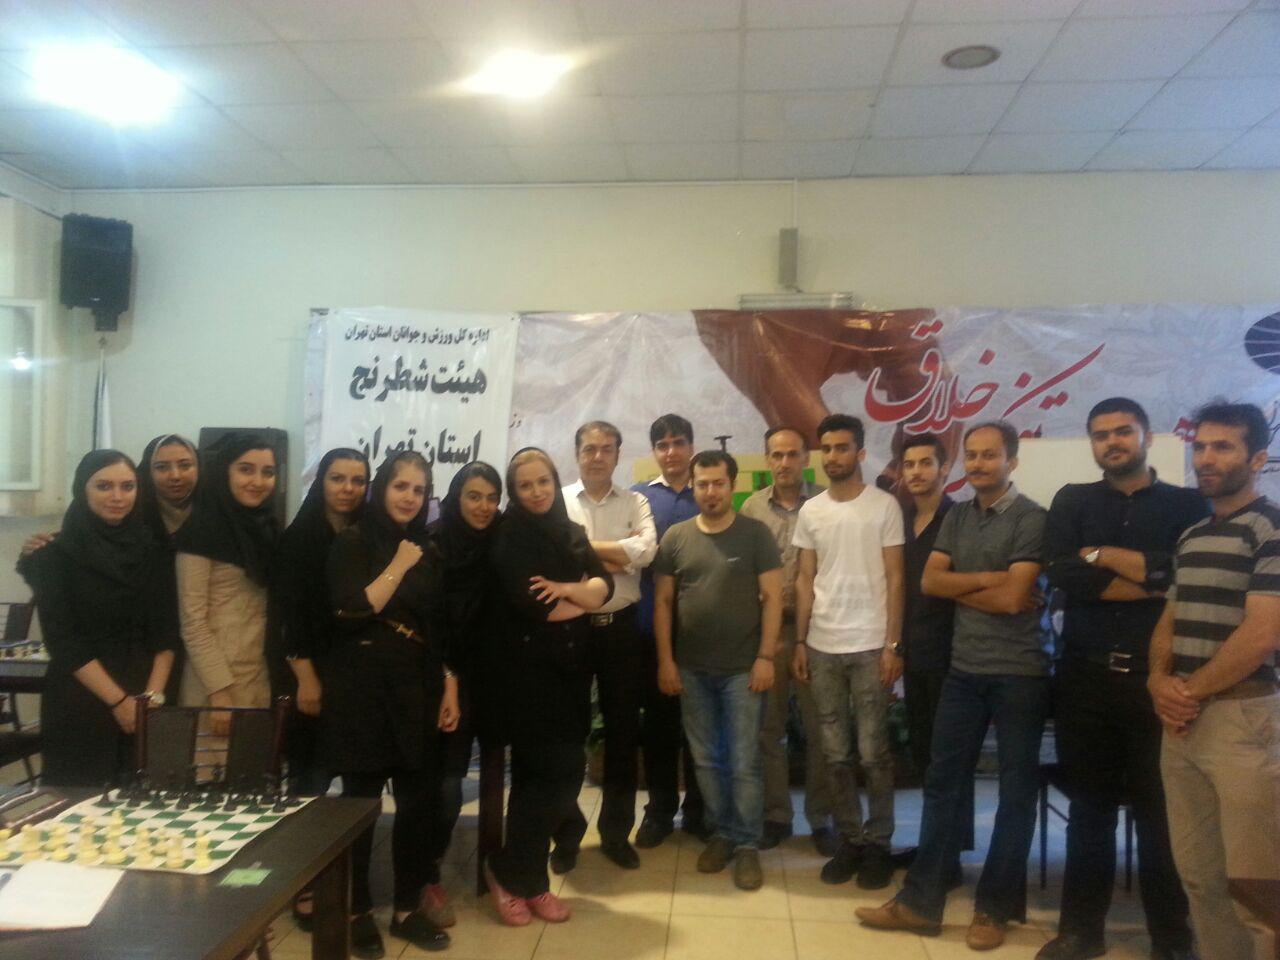 اعلام اسامی قبول شدگان دوره مربیگری شطرنج درجه سه تهران